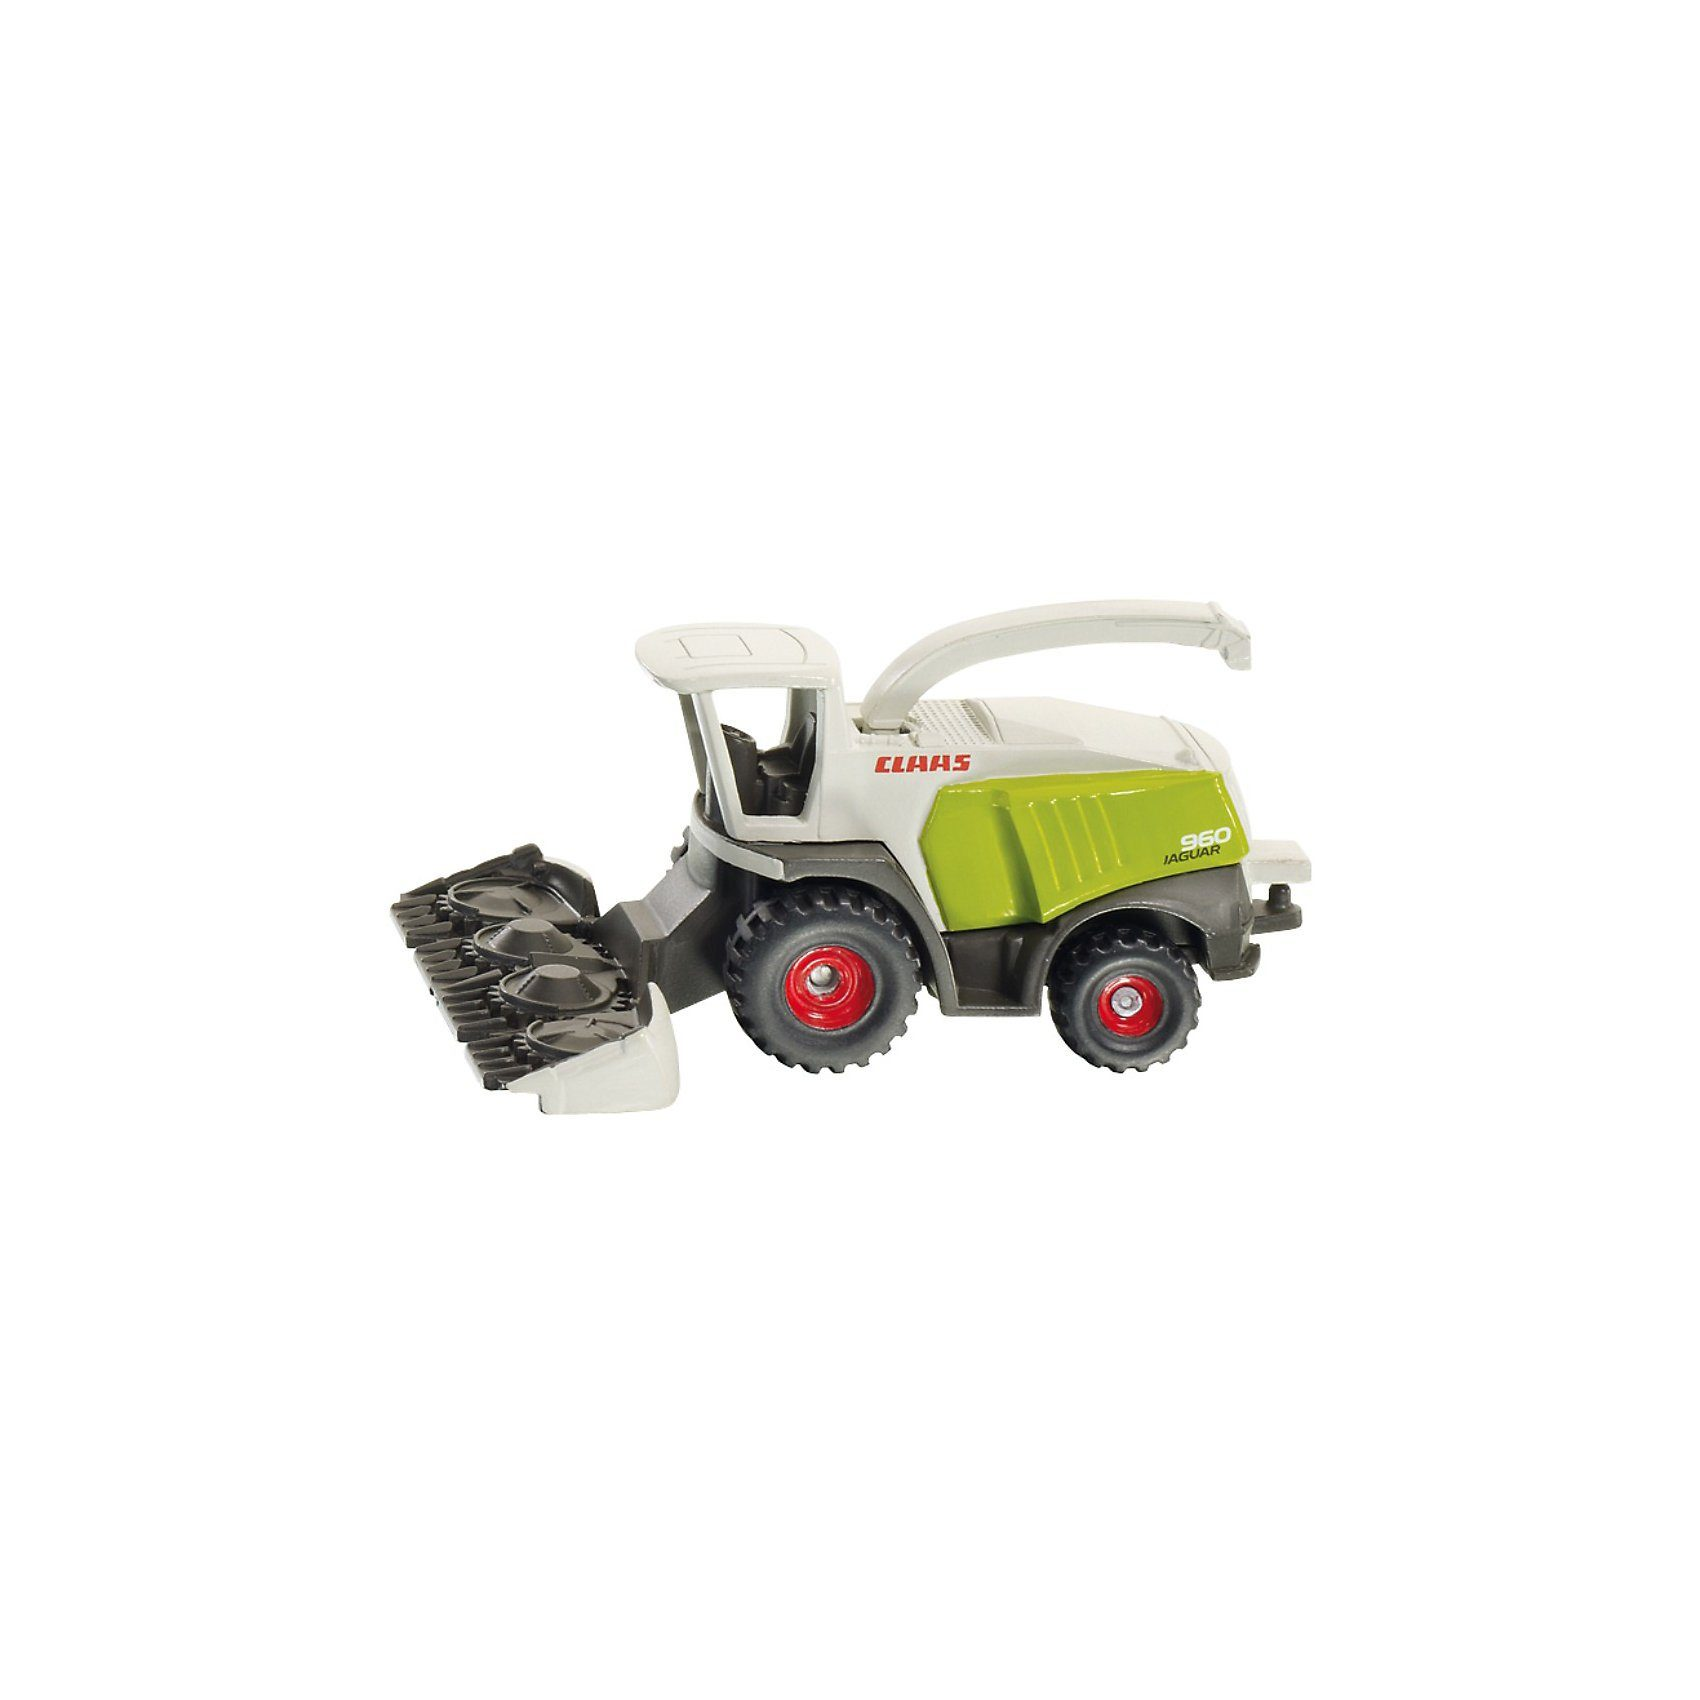 siku Claas Mähdrescher sortiert Spielzeugauto Anhänger Traktor Landwirtschaft